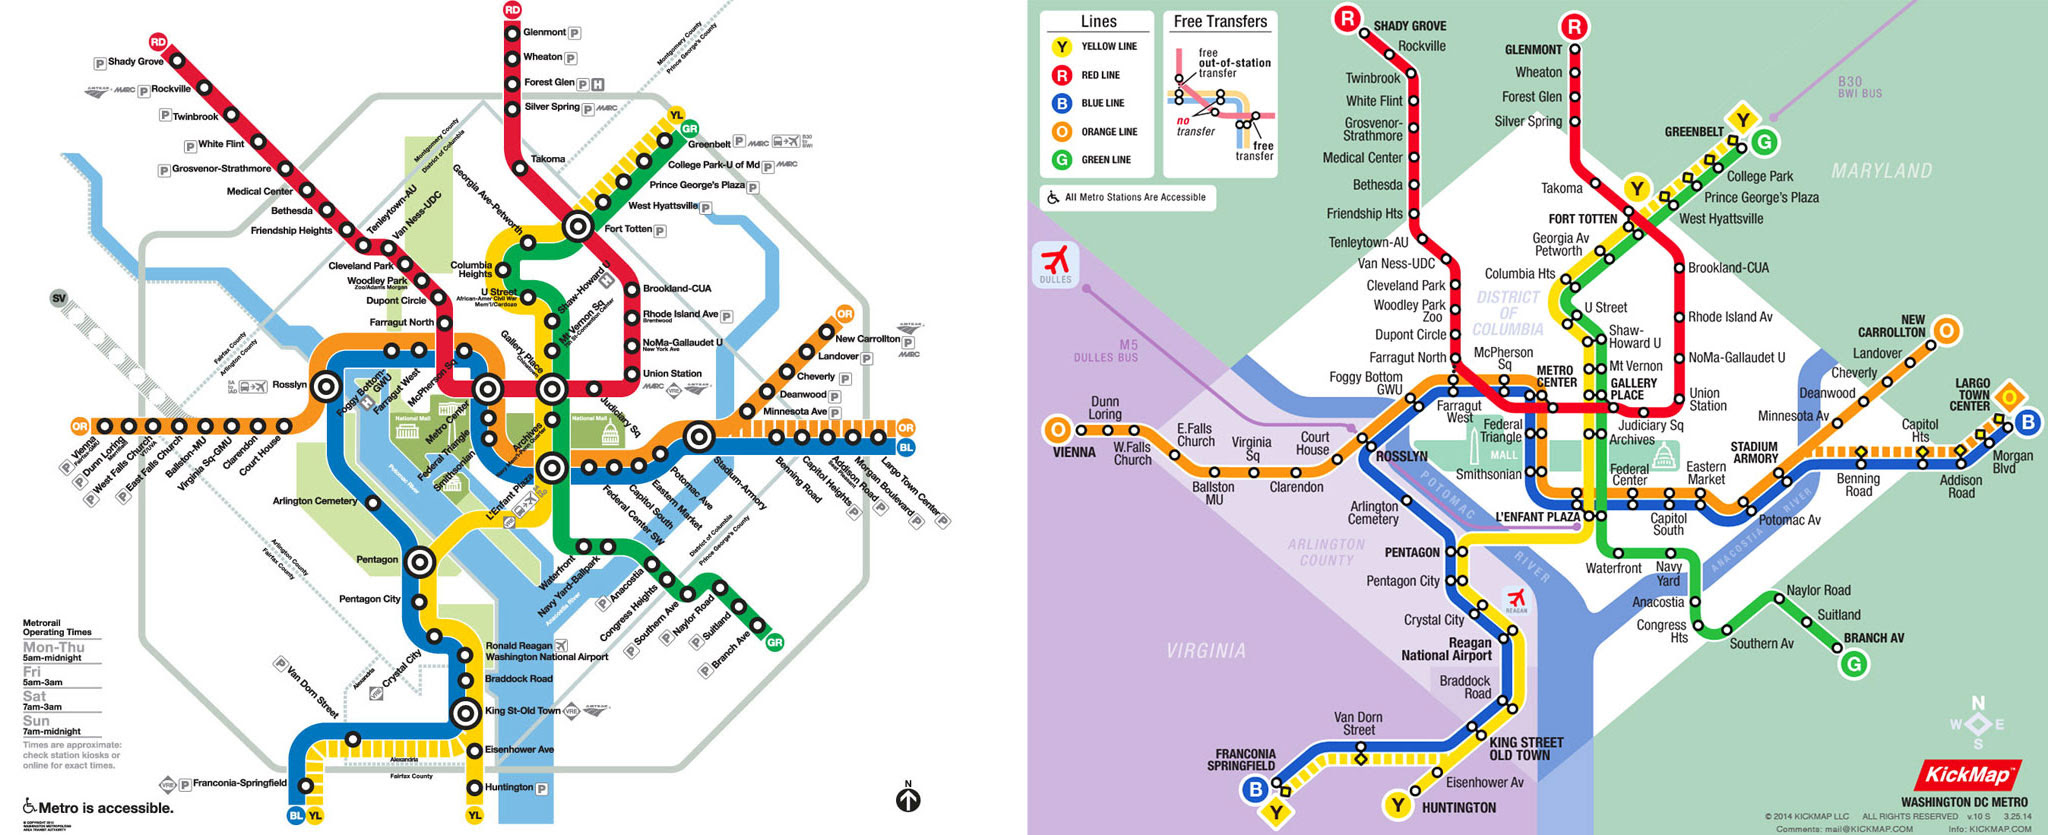 Washington Dcdc Subway Map.Official Dc Metro Map Time Zones Map